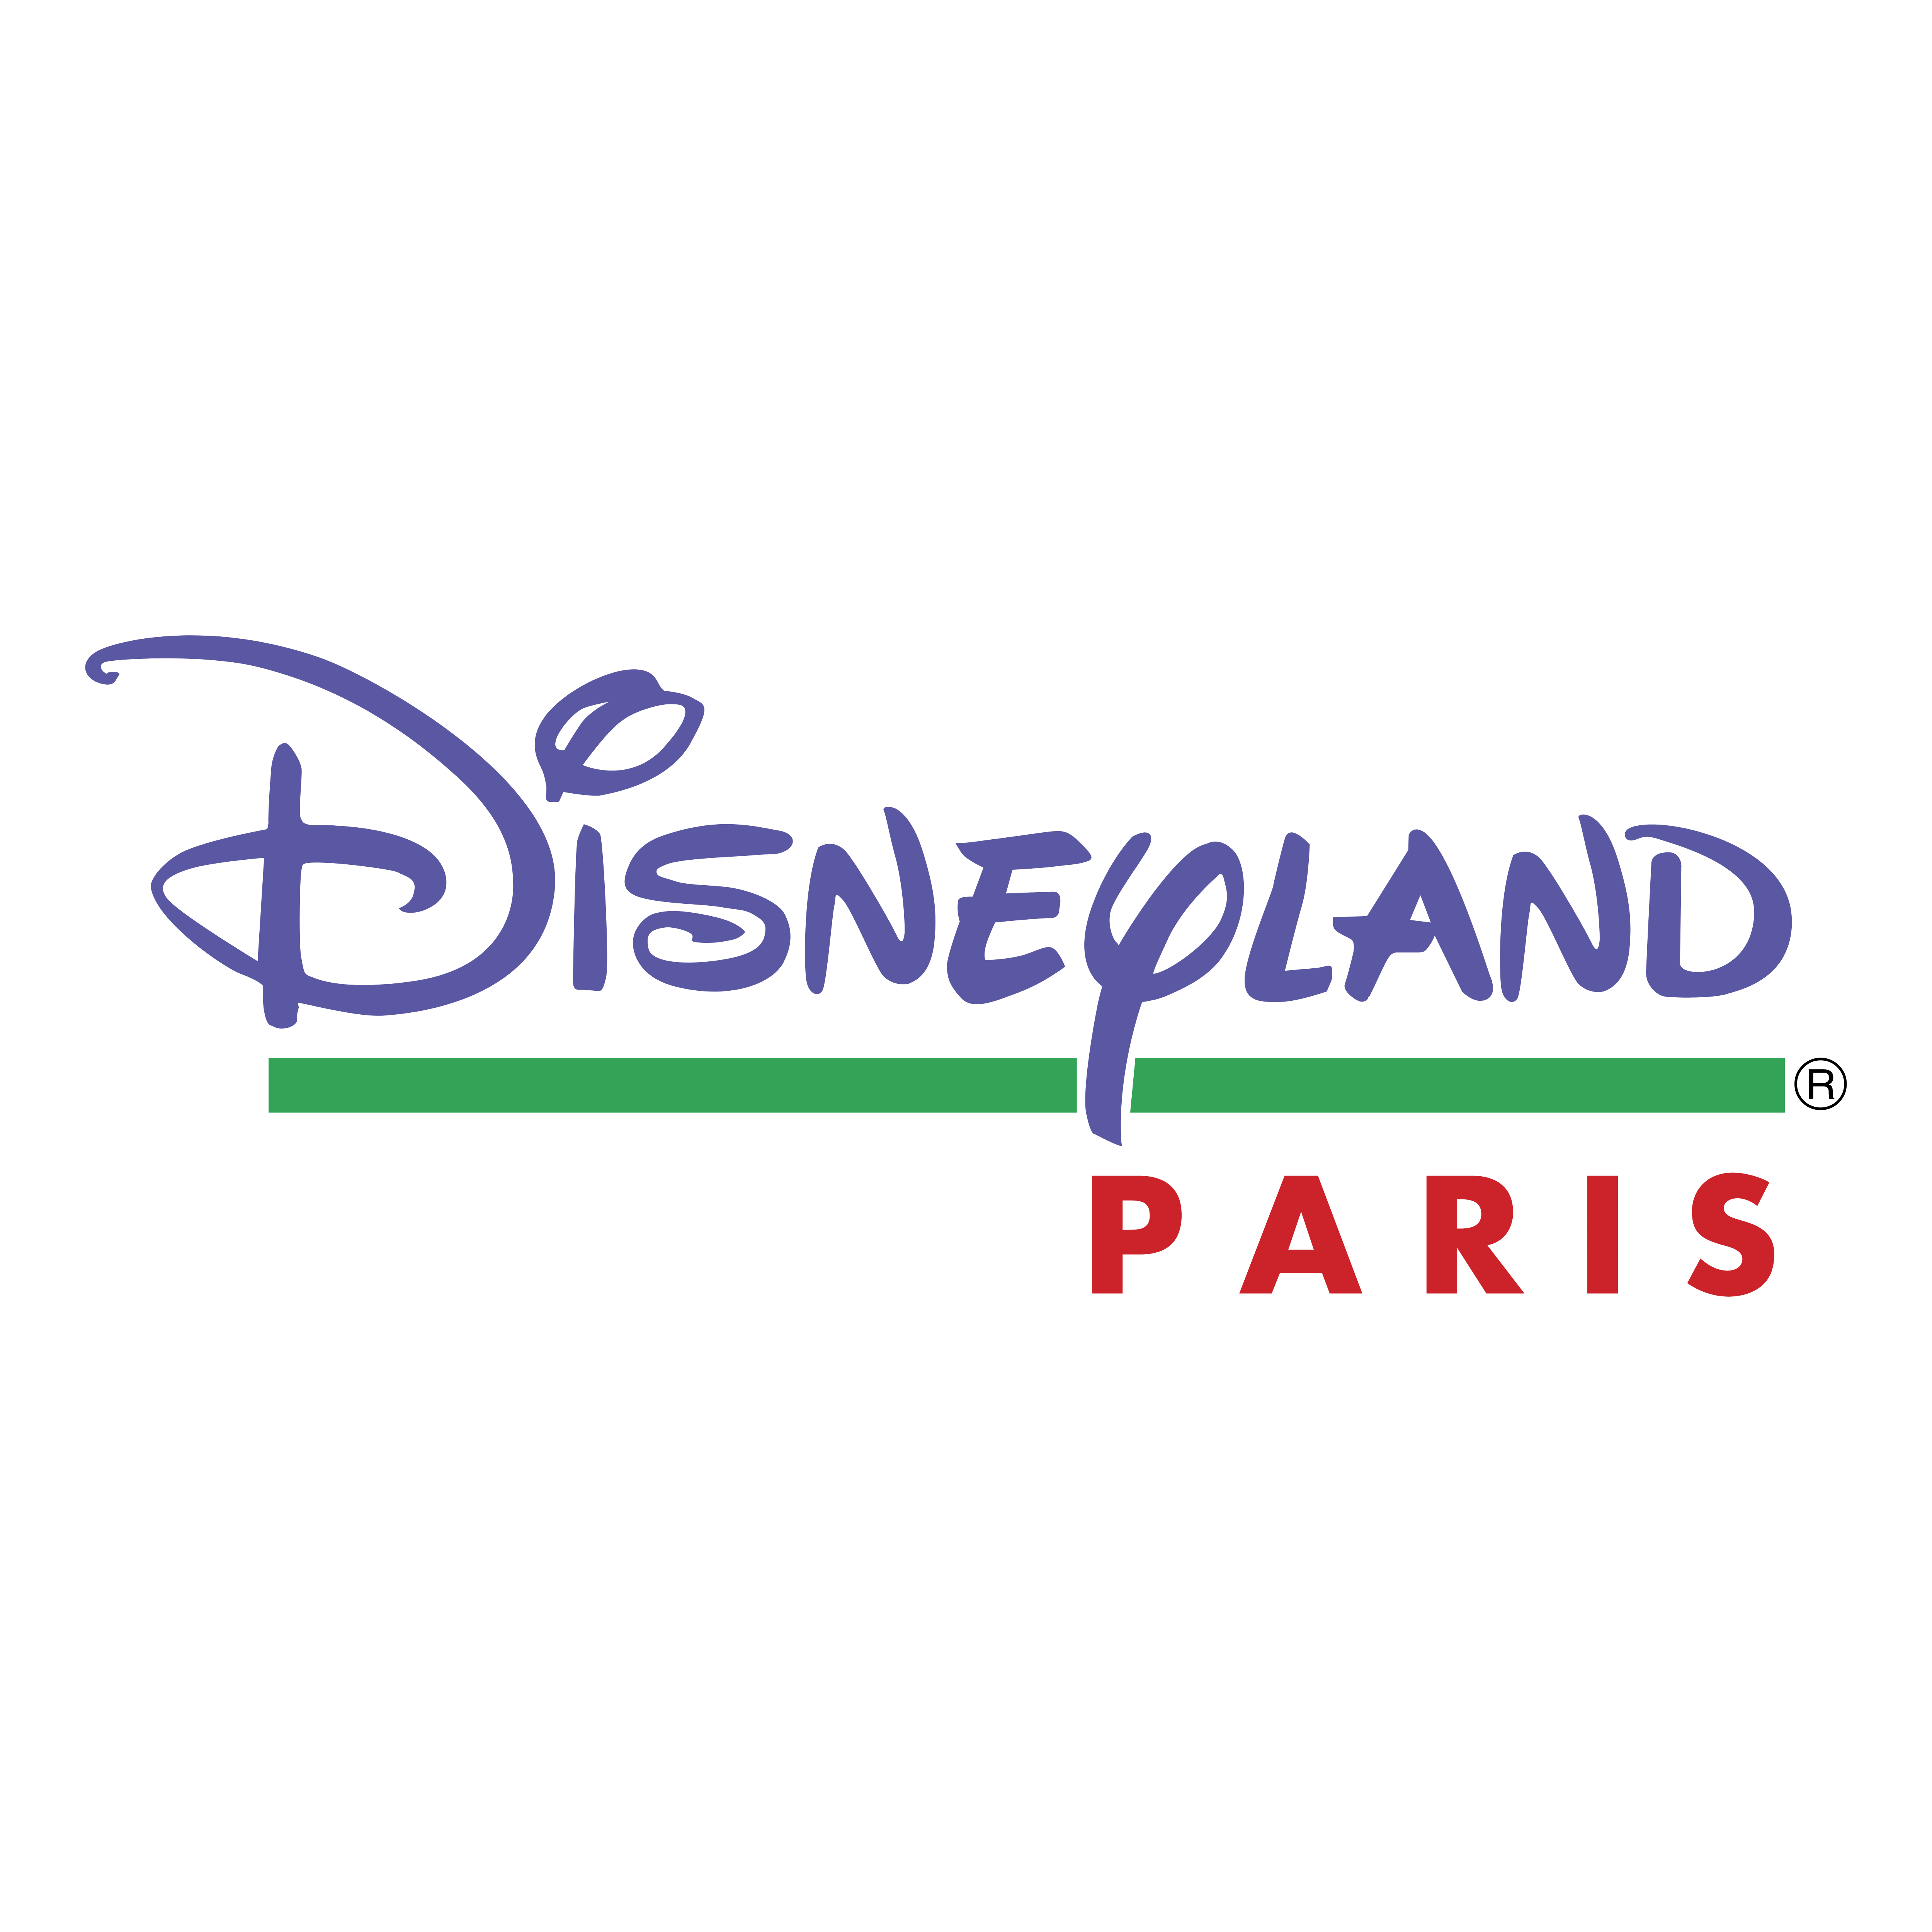 Disneyland Paris Schriftzug